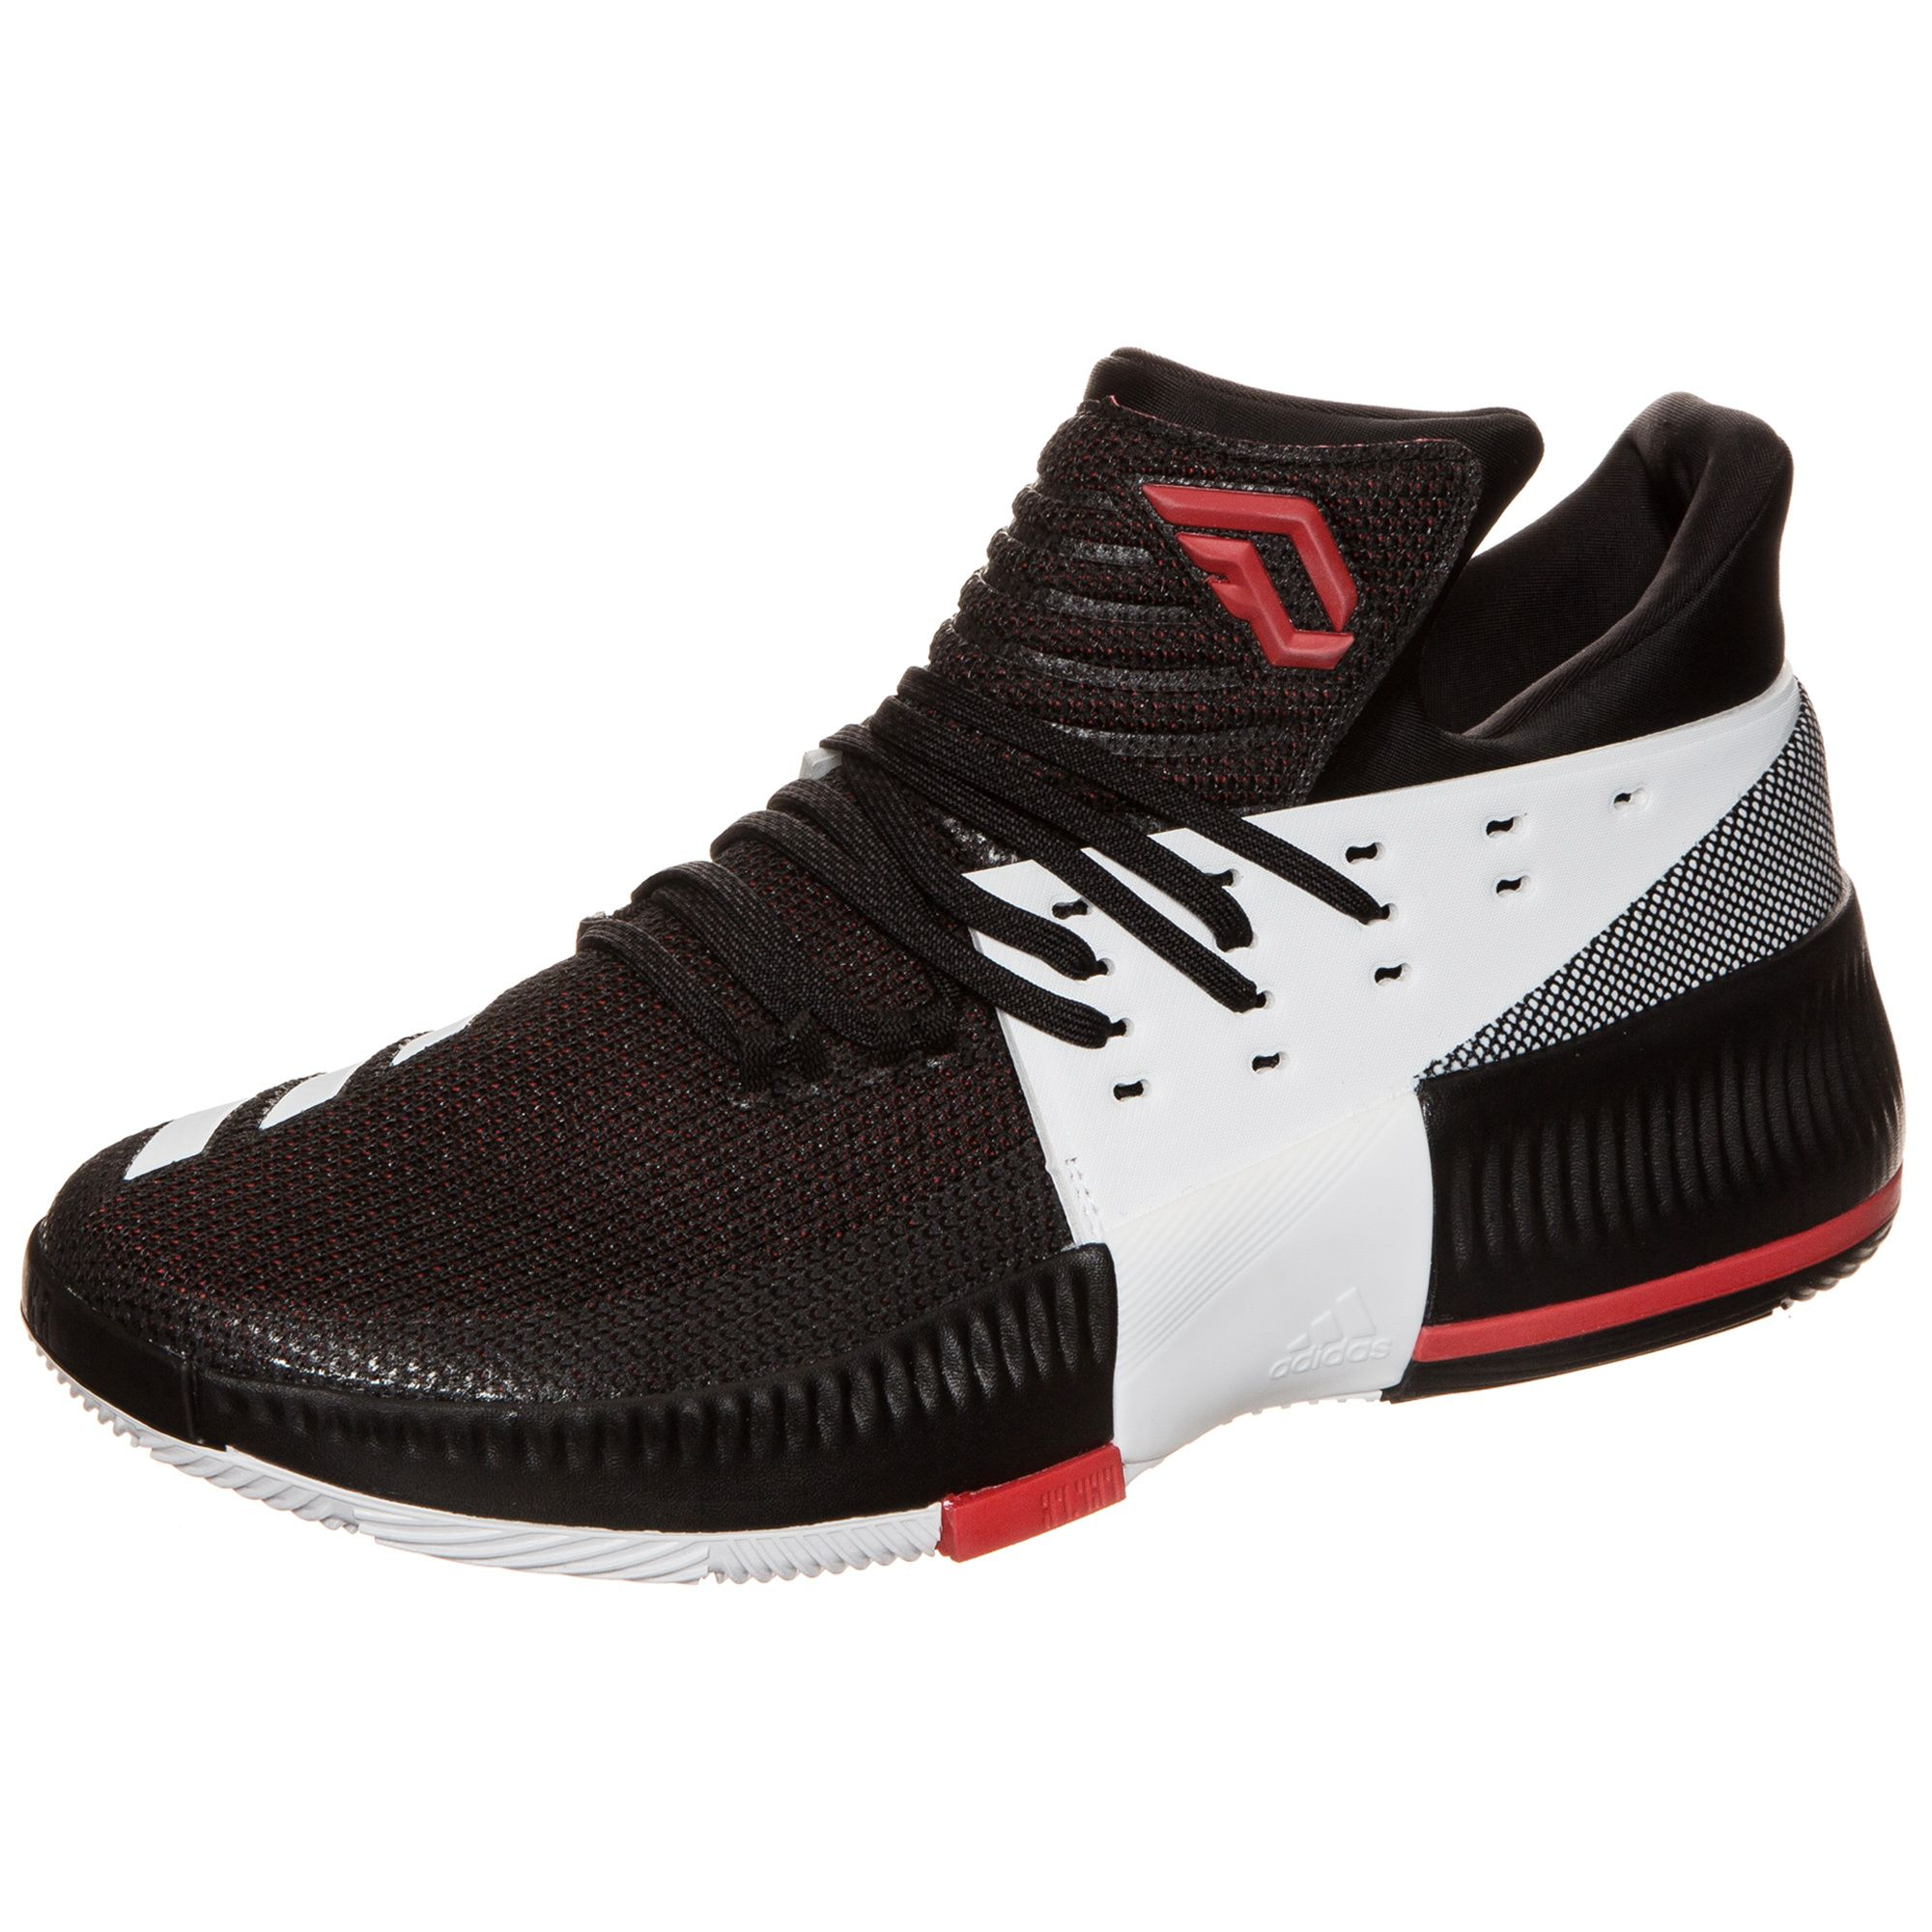 ADIDAS PERFORMANCE adidas Performance Dame 3 On Tour Basketballschuh Herren